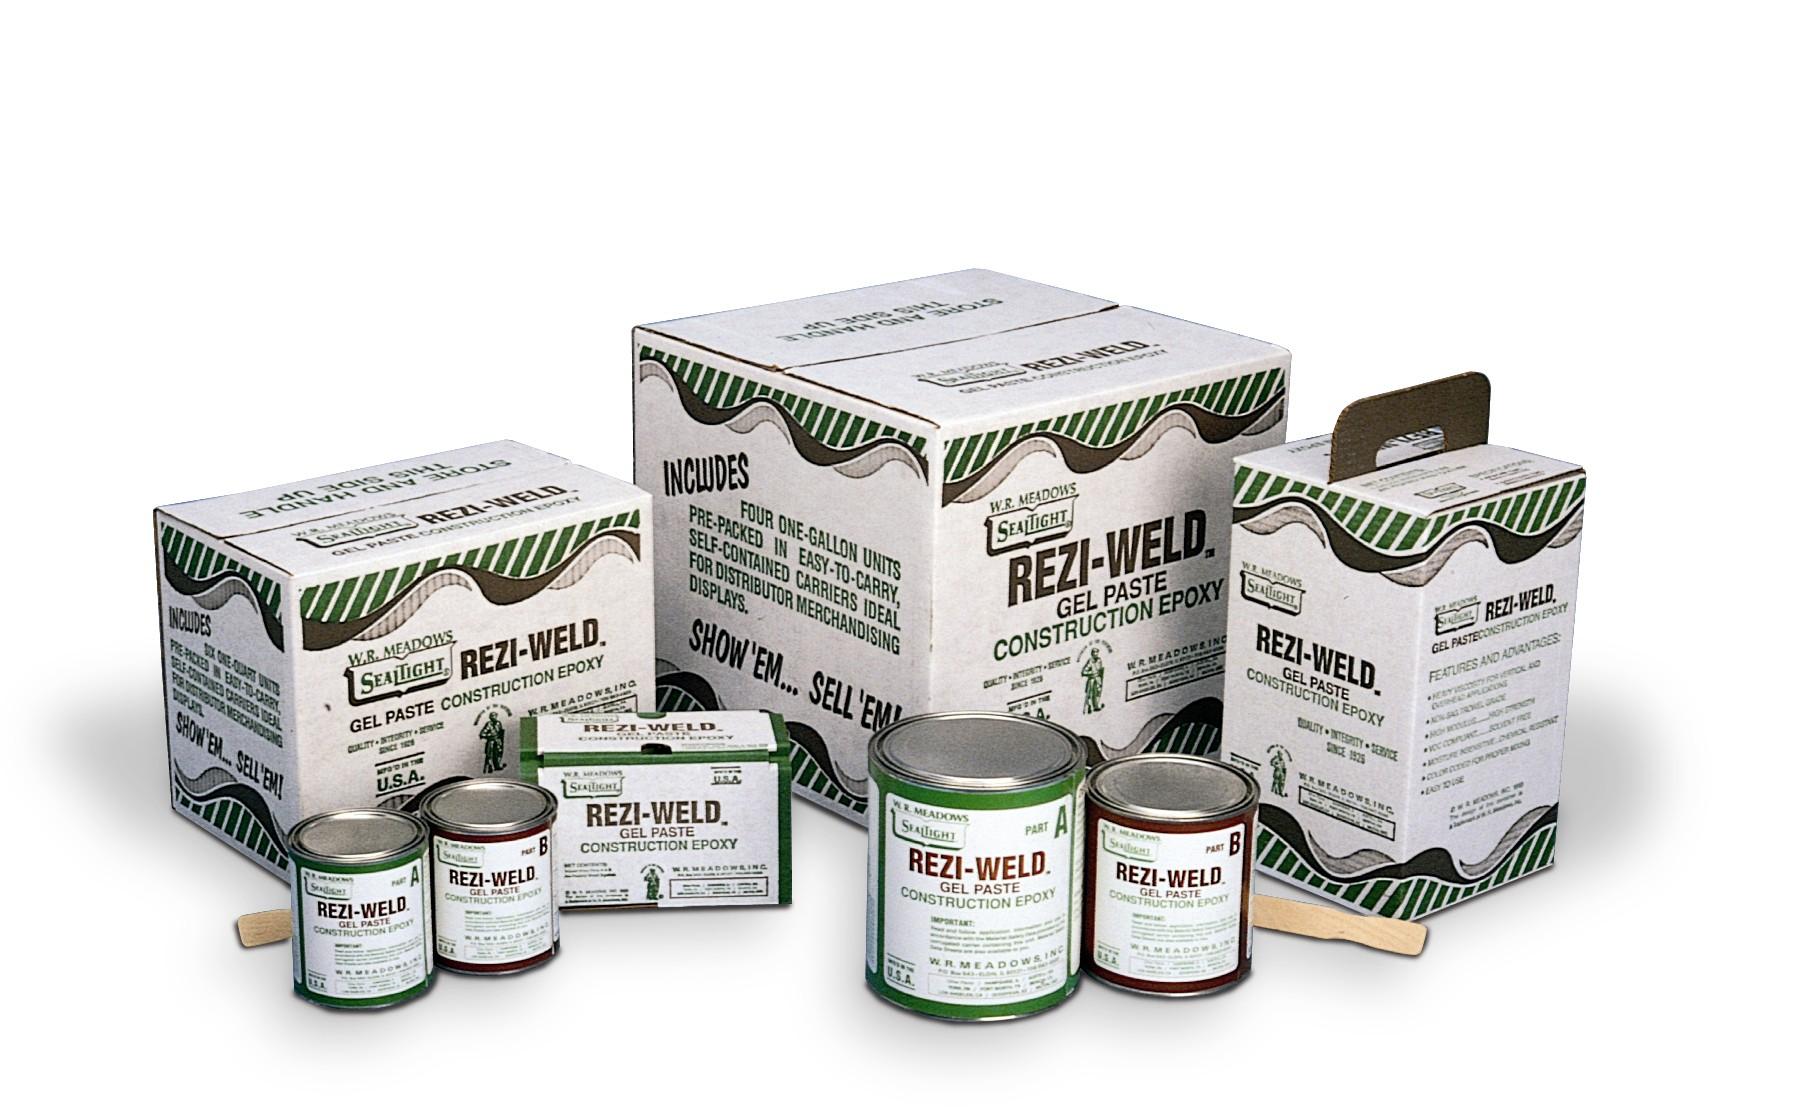 Rezi Weld Epoxy : Rezi weld gel paste qrt northland construction supplies